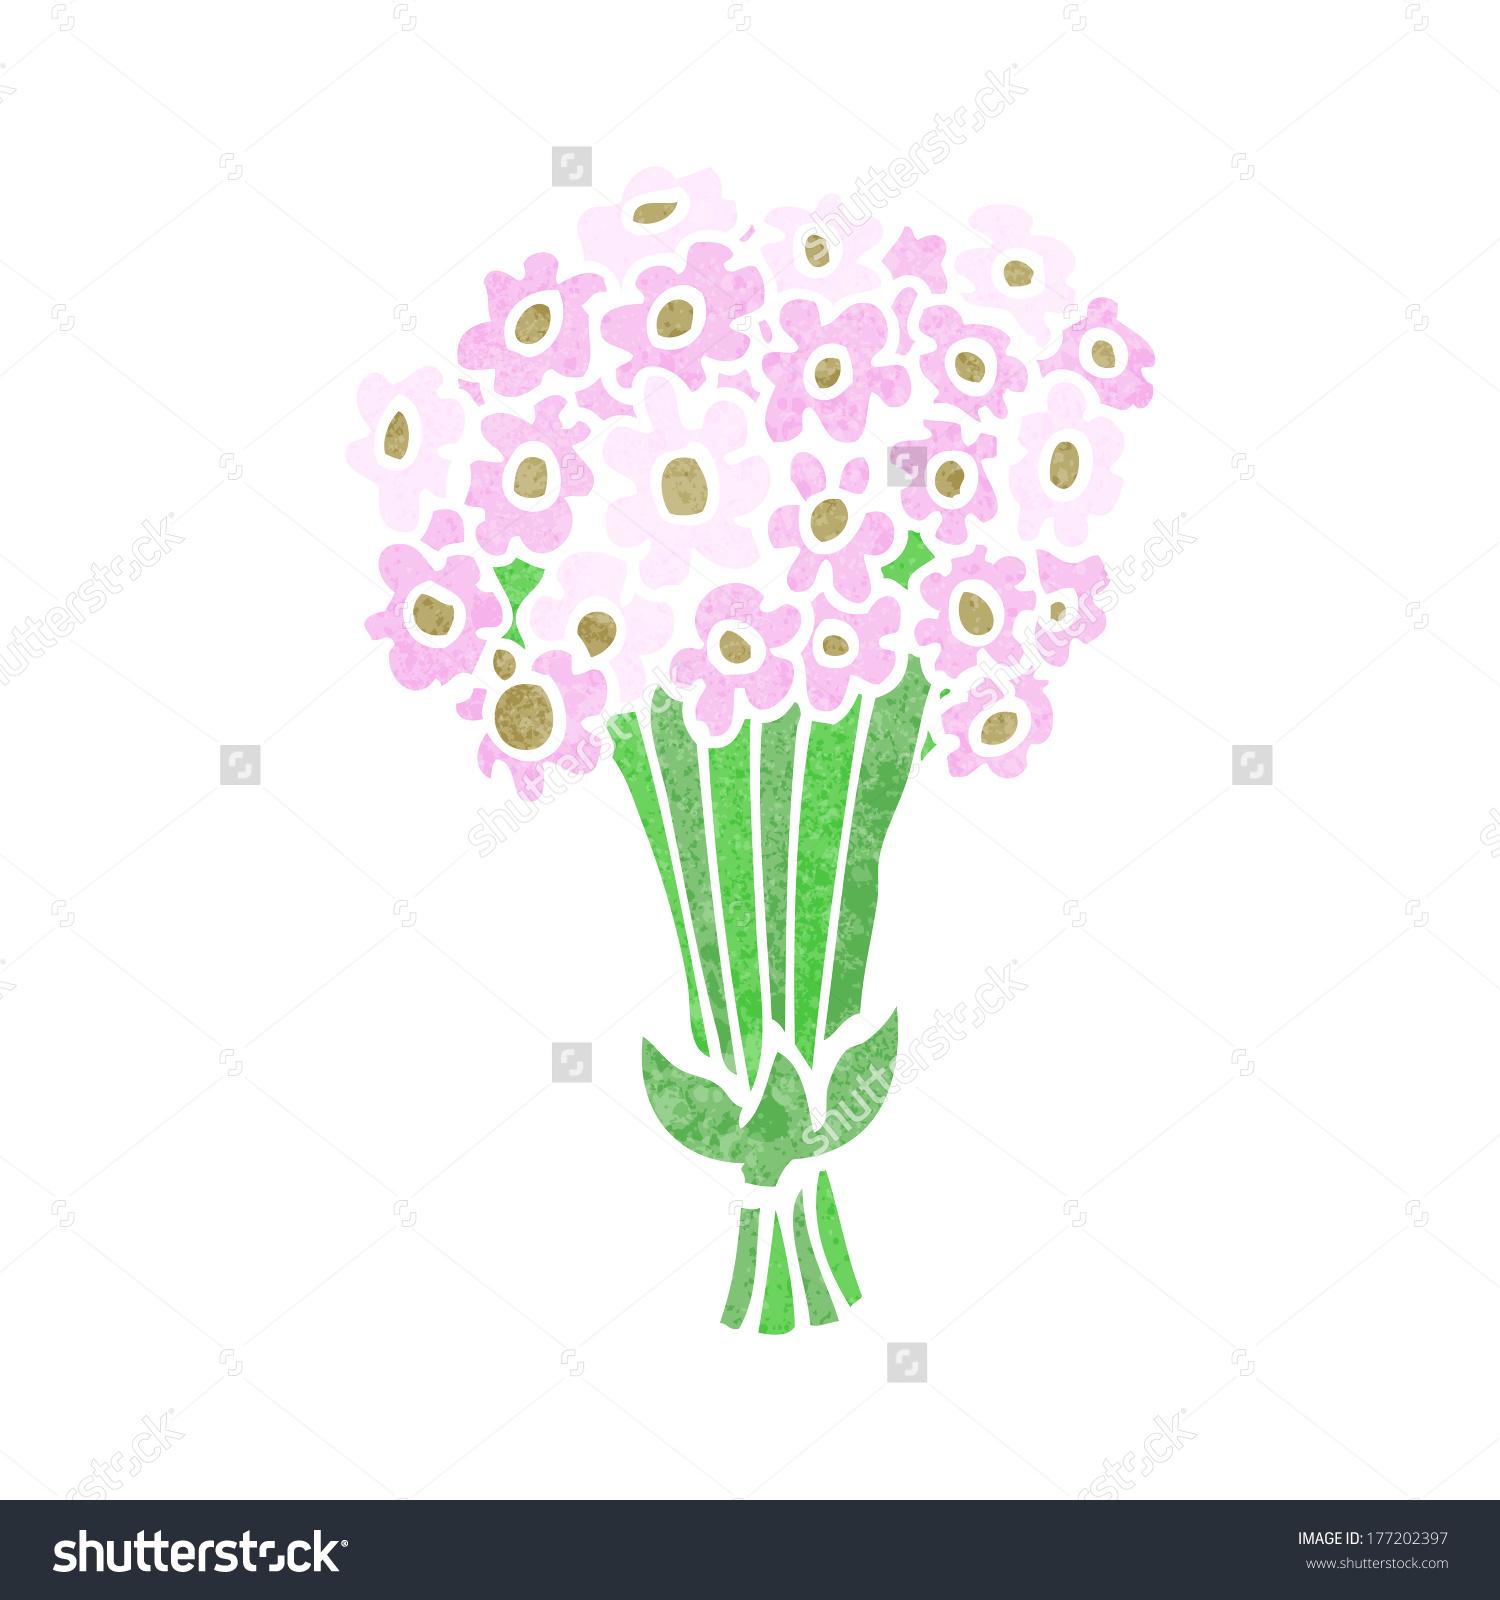 Cartoon bunch of flowers banner freeuse download Cartoon Flowers Stock Vector 177202397 - Shutterstock banner freeuse download